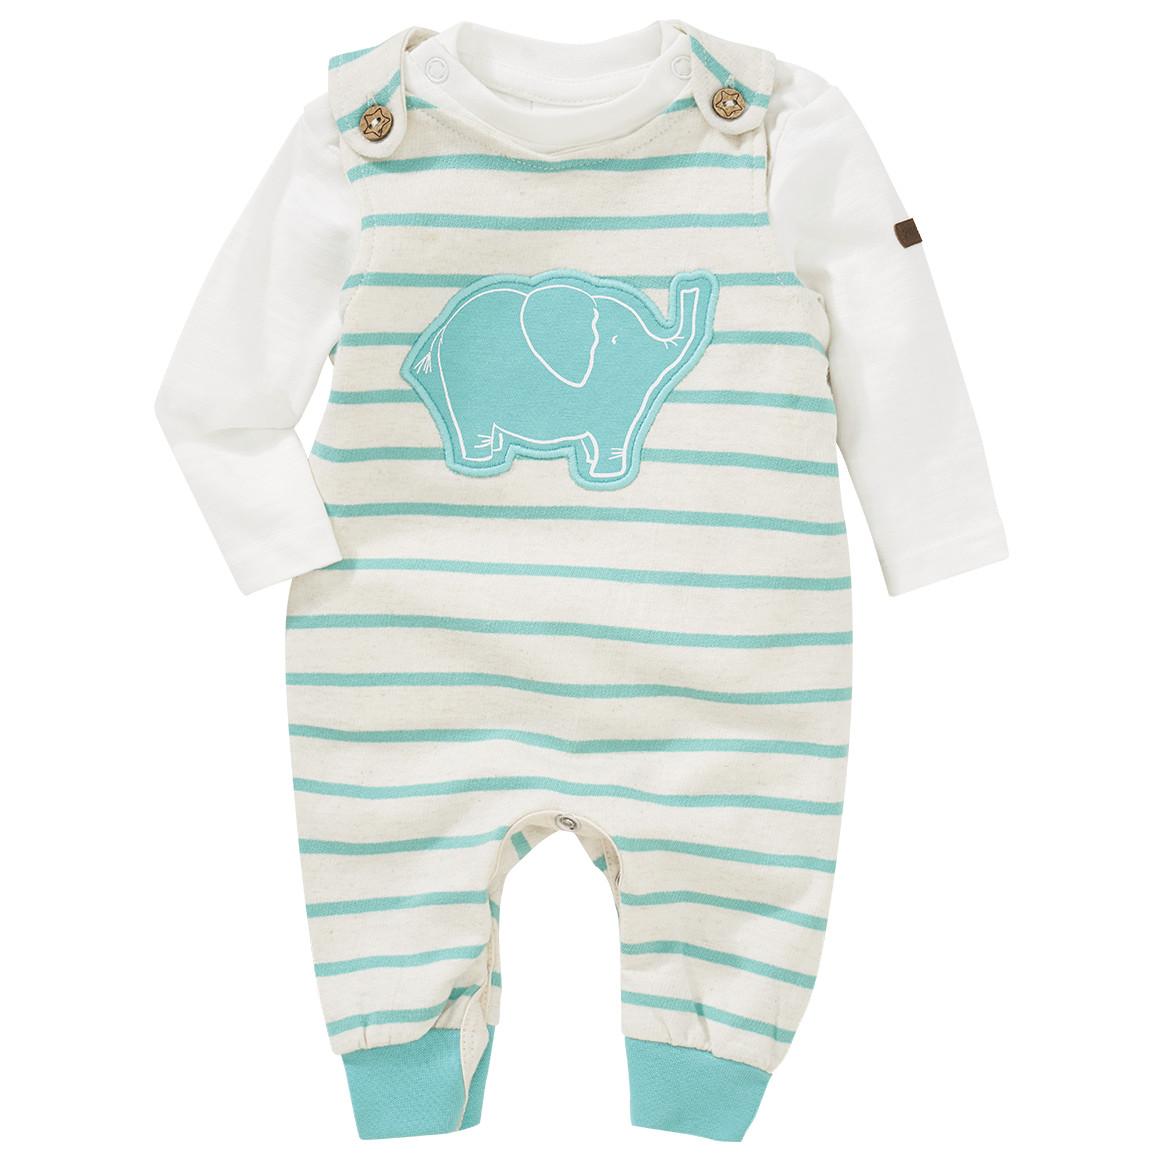 Babystrampler - Newborn Strampler und Langarmshirt im Set - Onlineshop Ernstings family